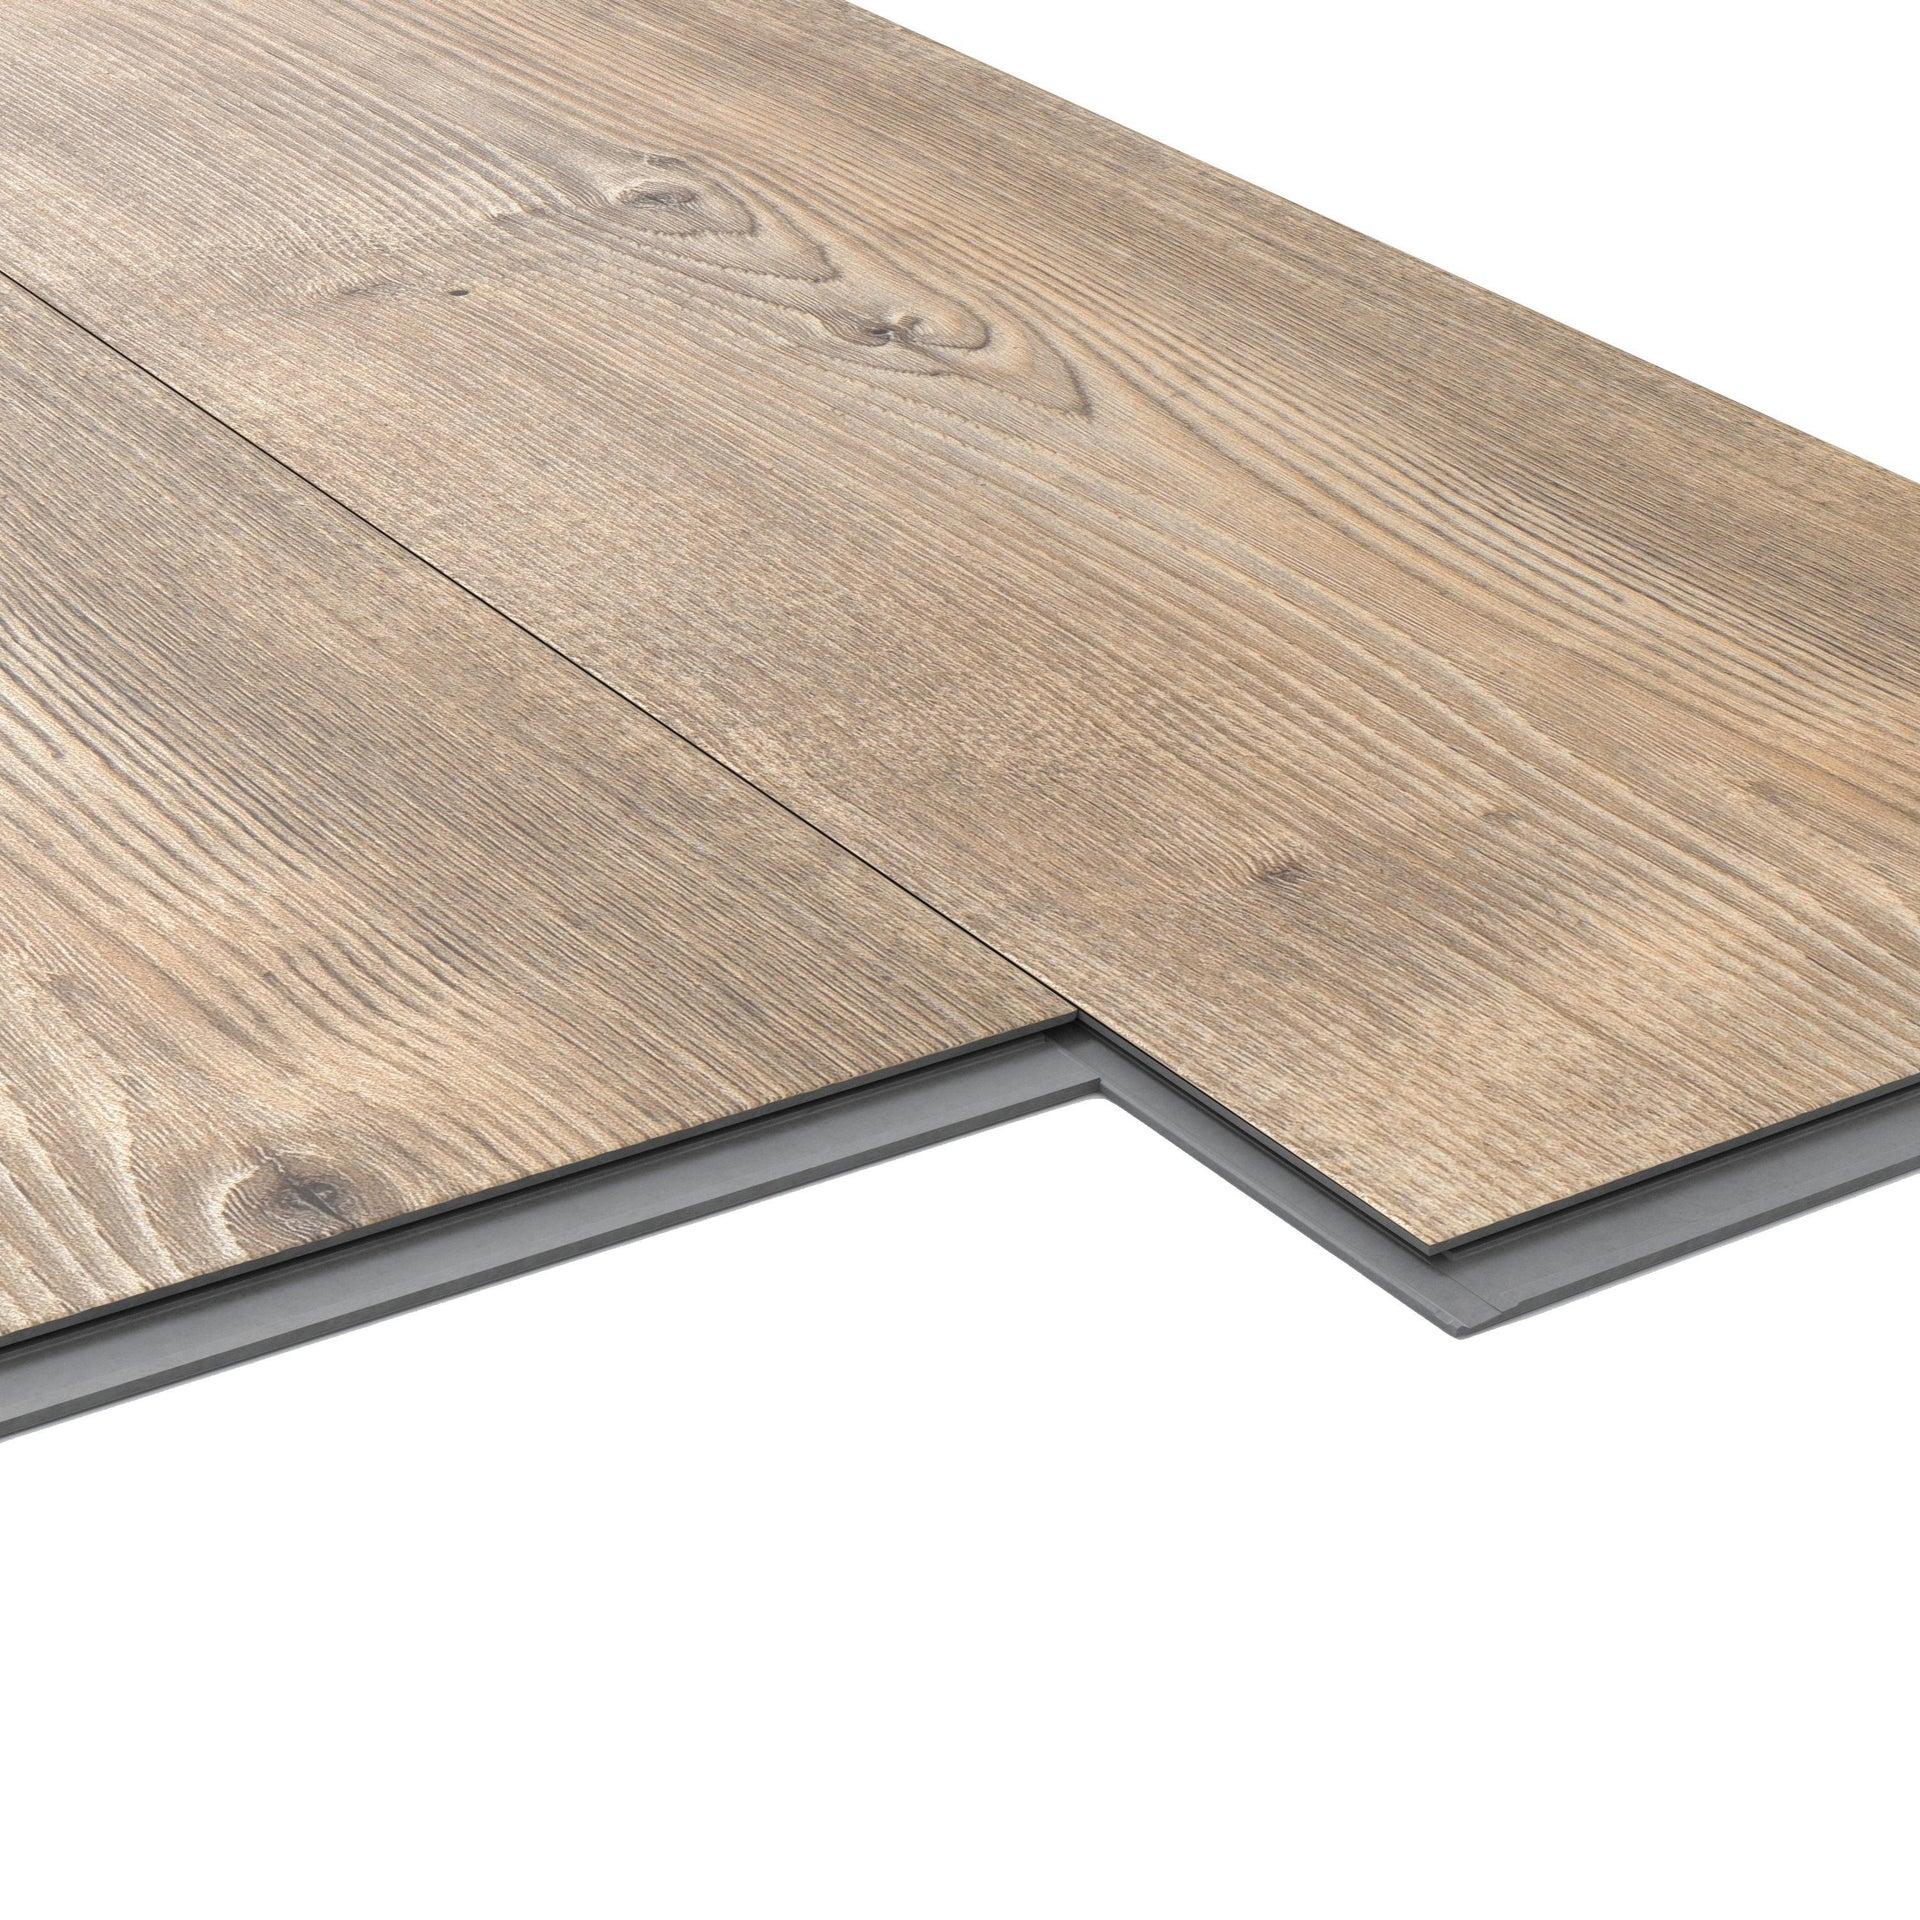 Pavimento PVC flottante clic+ Nat Old Sp 4.2 mm giallo / dorato - 3